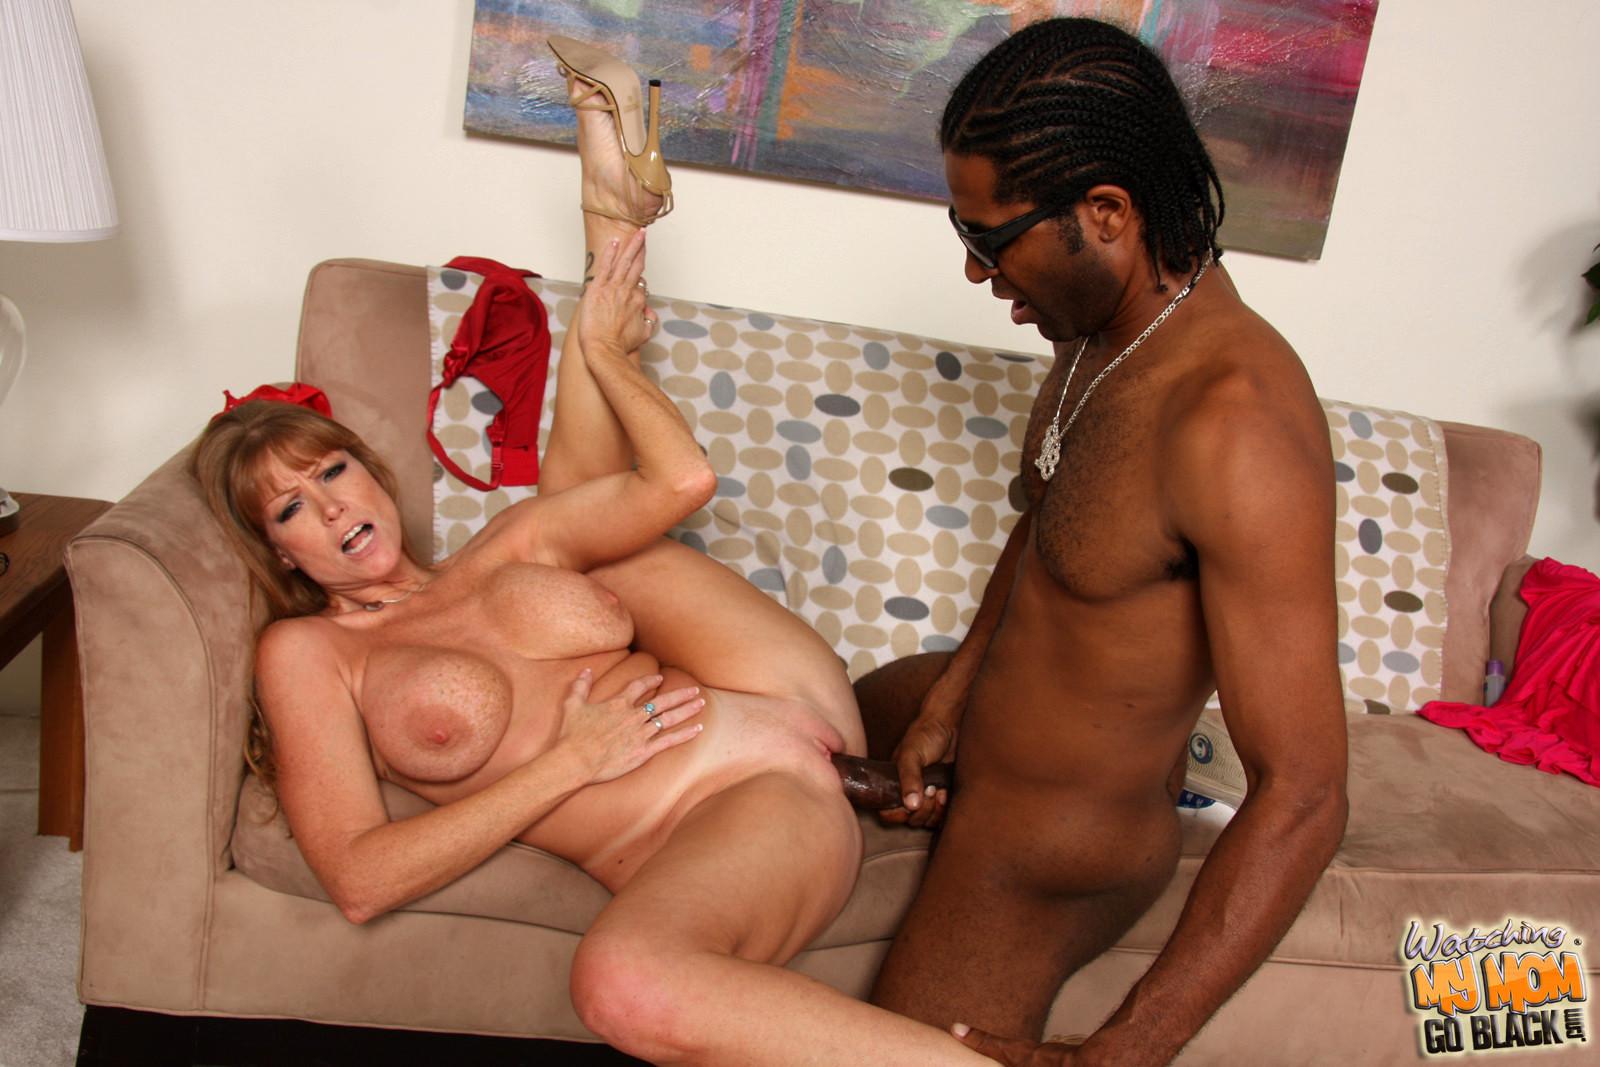 Big Cock Mom Sex Images And Huge Dick Milf Online Pics